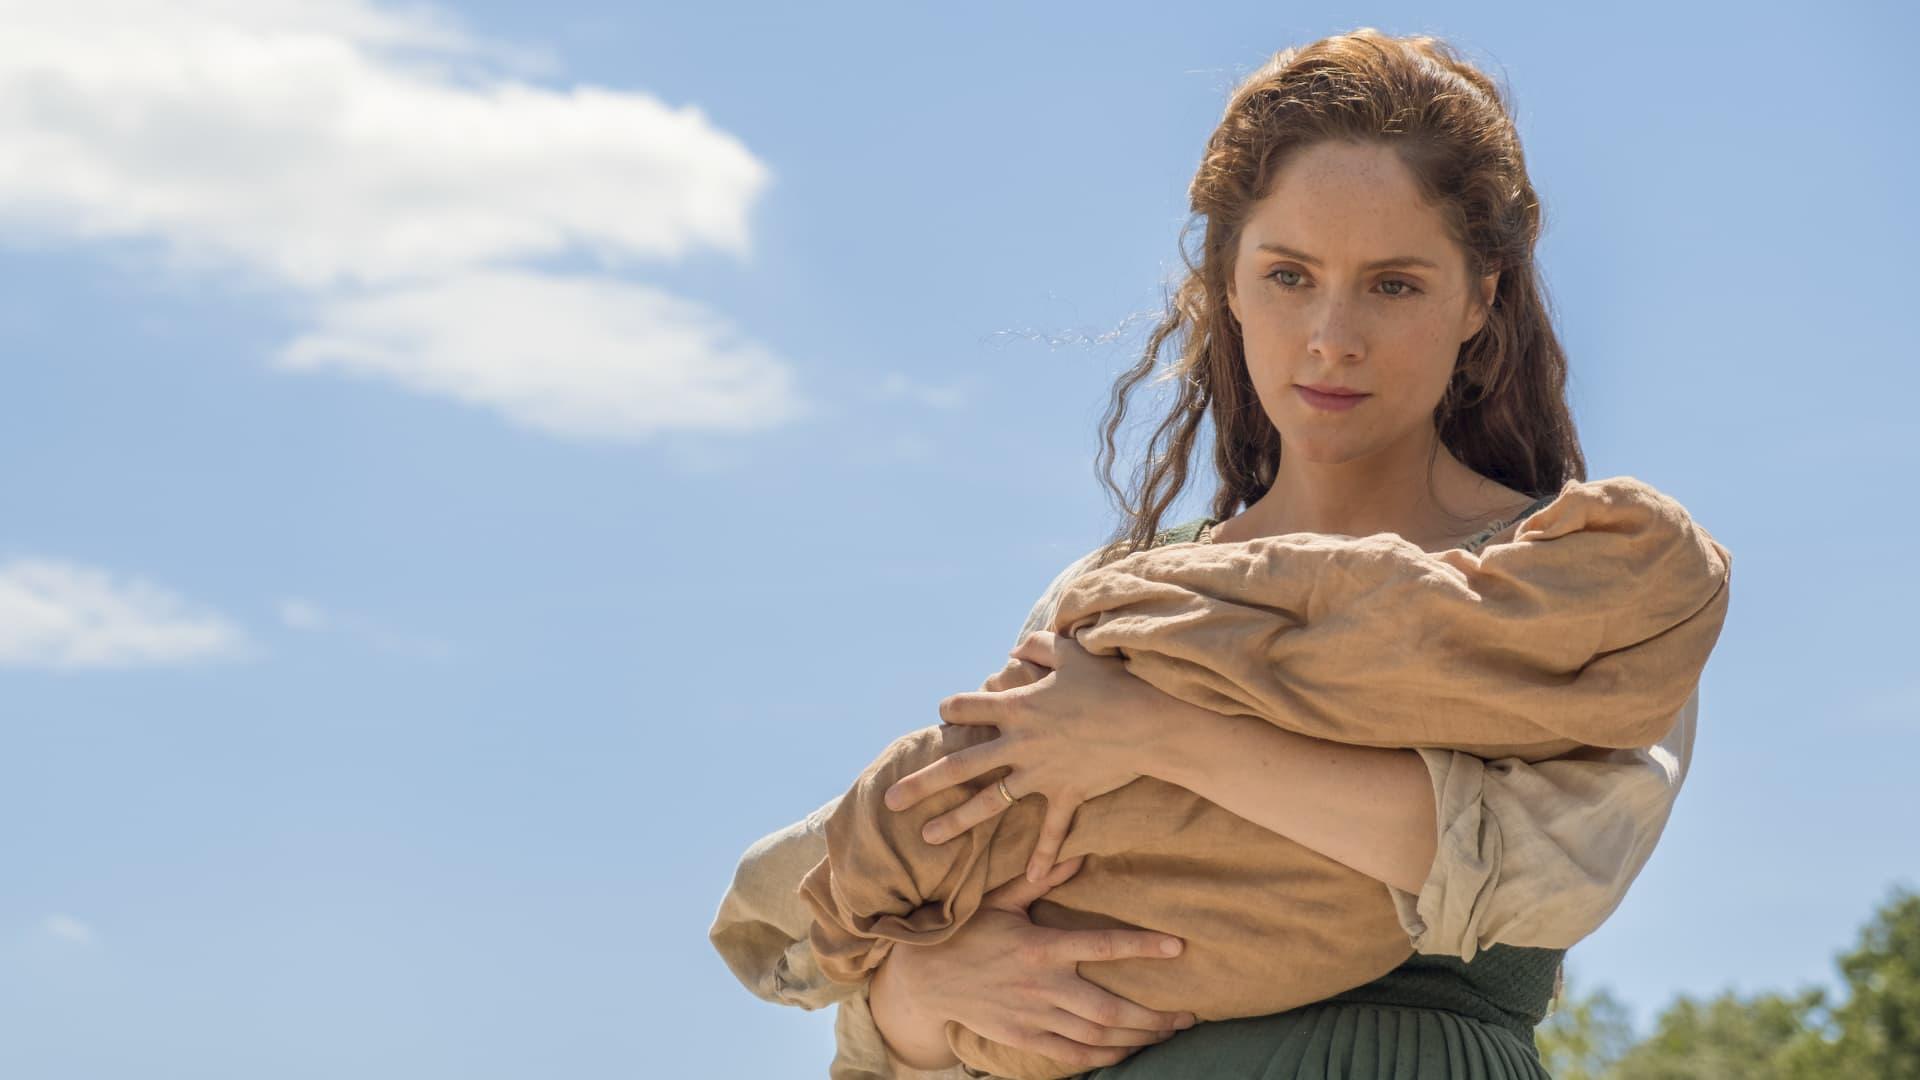 Jamestown (S02E01): Series 2, Episode 1 Summary - Season 2